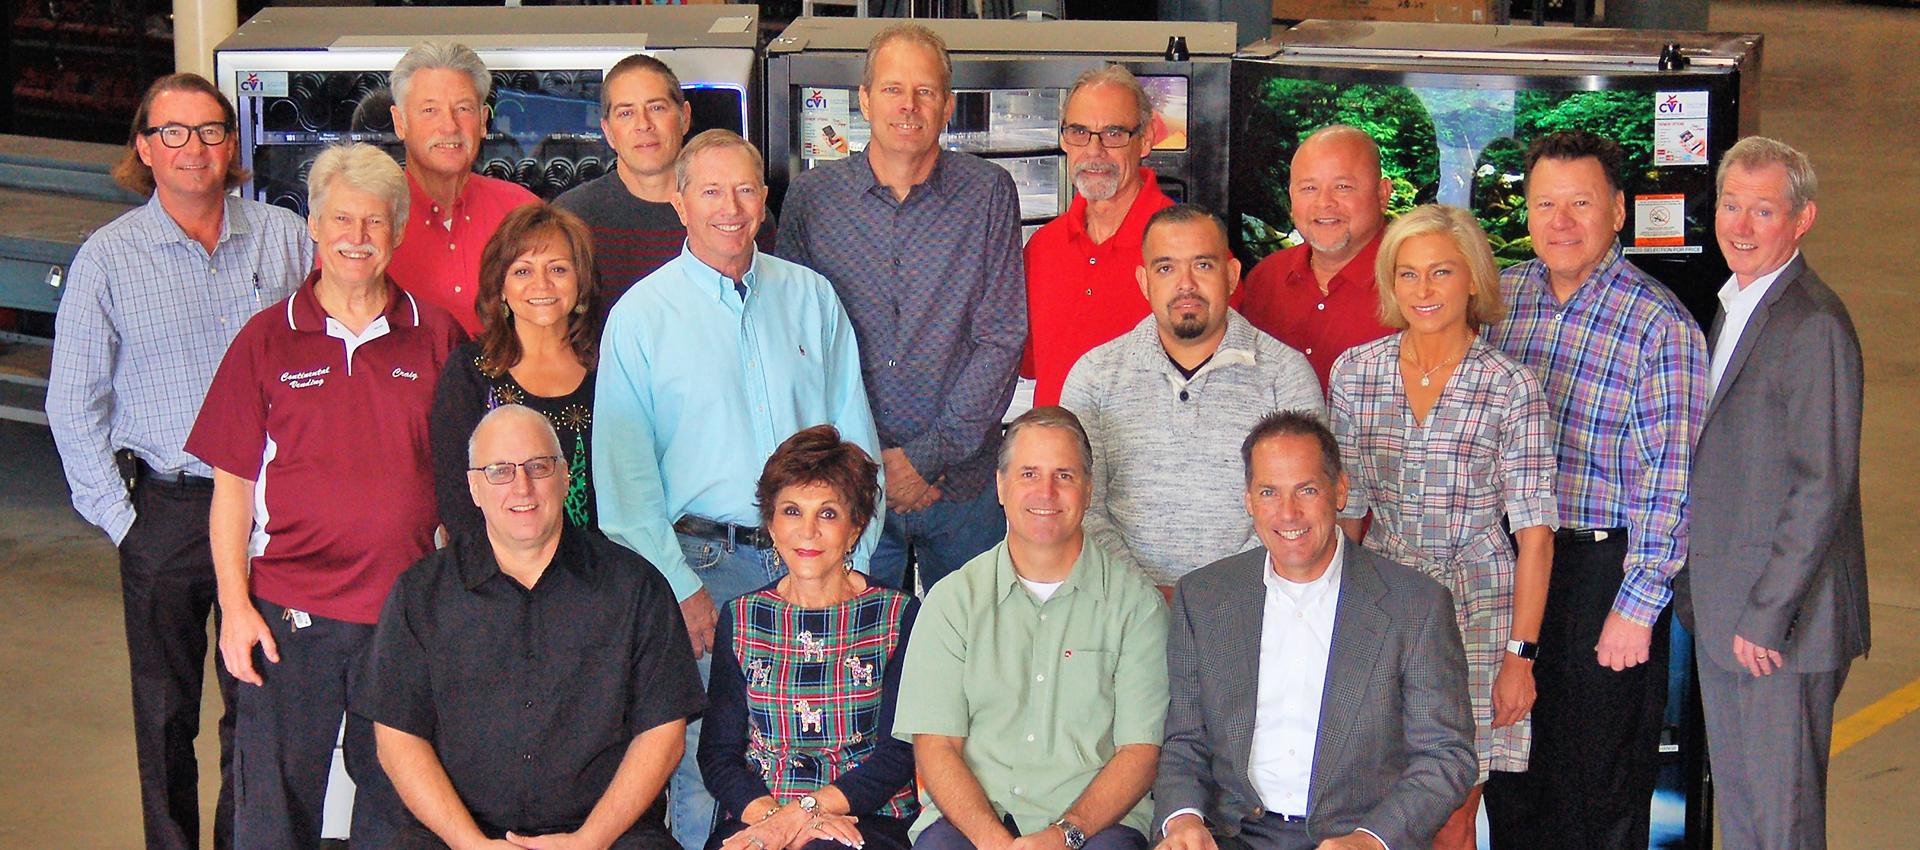 Continental Vending team photo